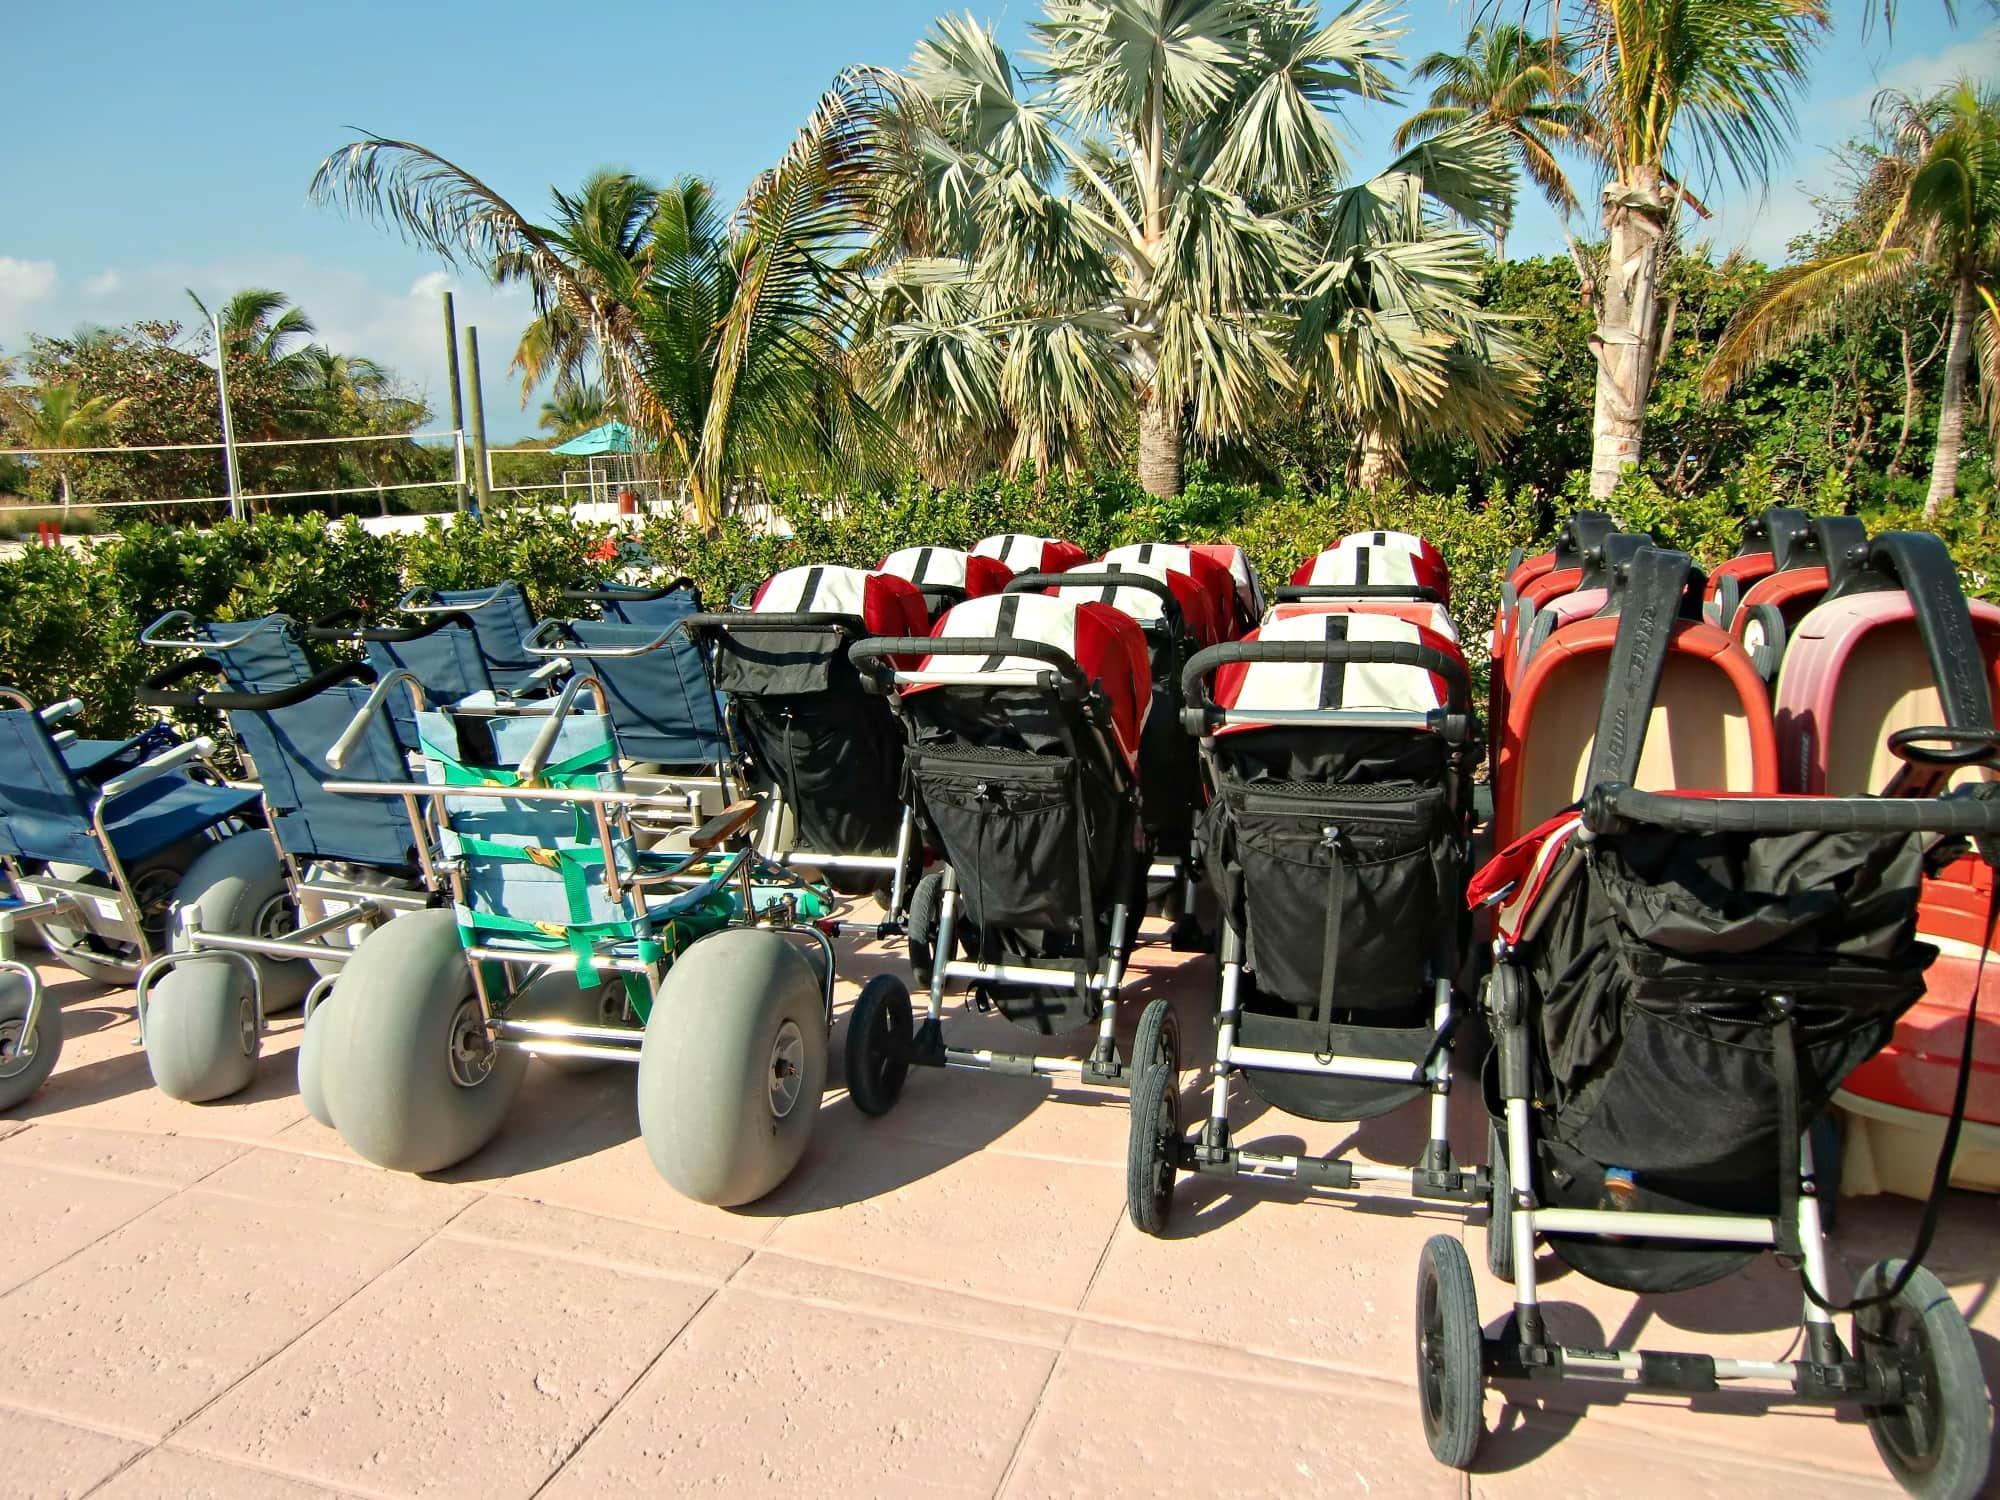 Borrow a stroller or wagon on Castaway Cay